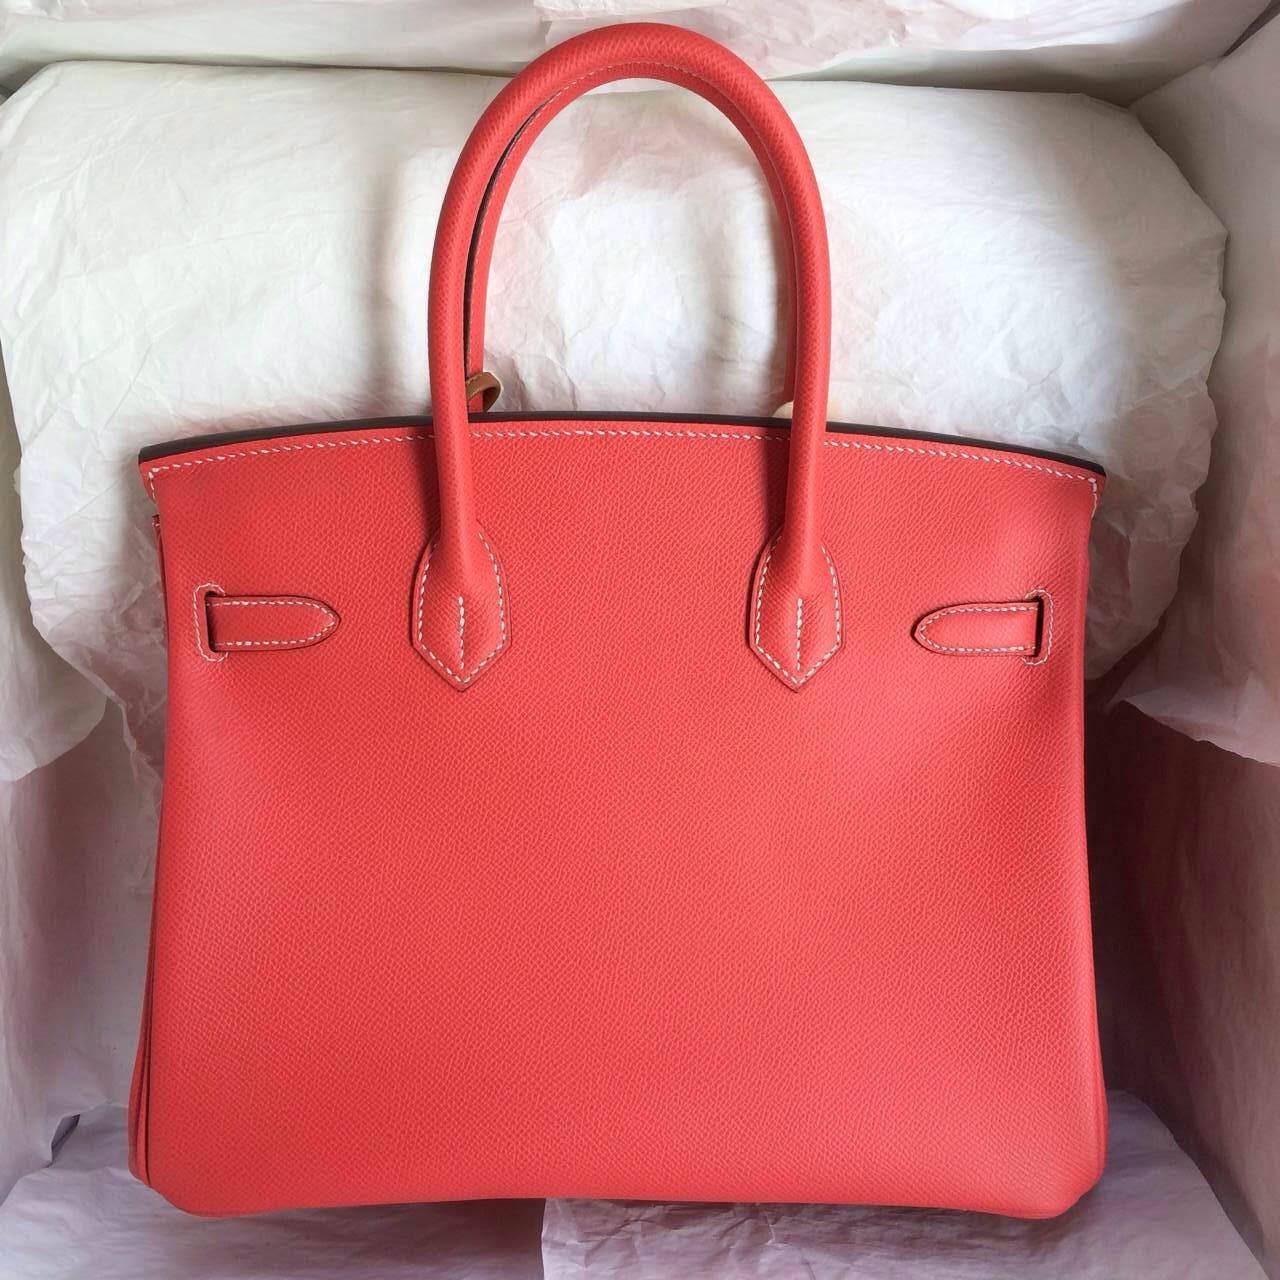 T5 Rose Jaipur France Epsom Leather Birkin Bags 30cm Hand Stitching Handbags